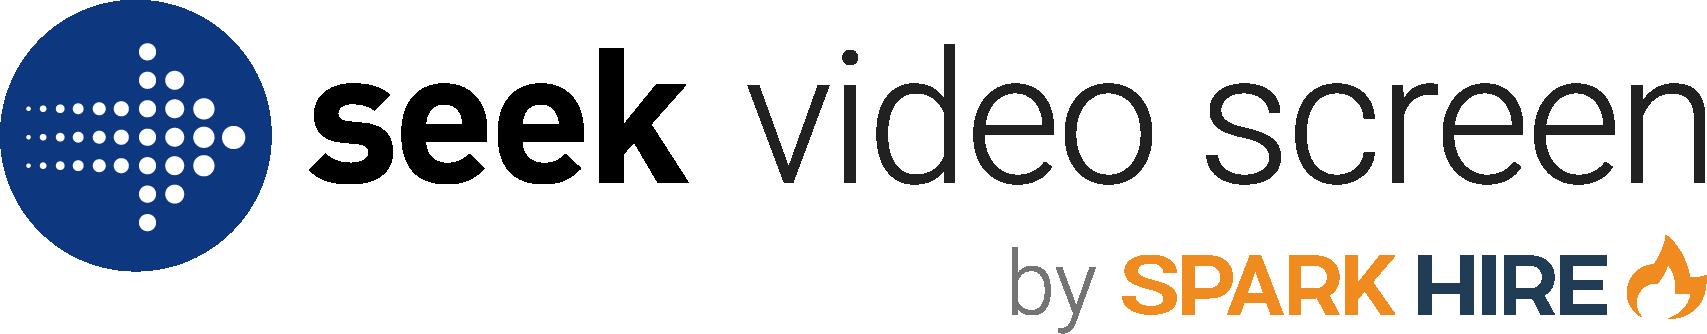 Seek Video